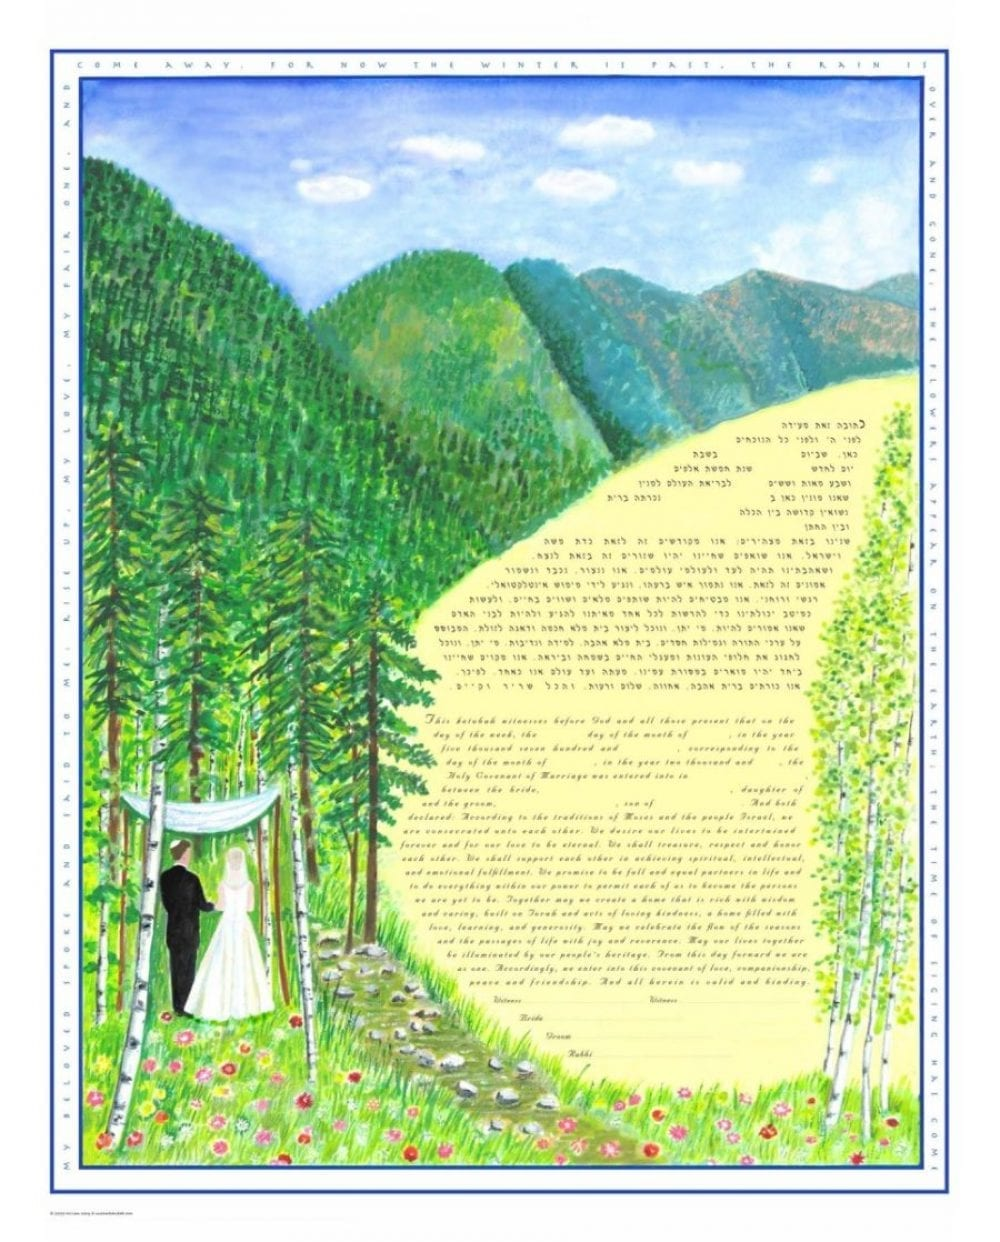 Mountain-Stream-Ketubah-Bride-Groom